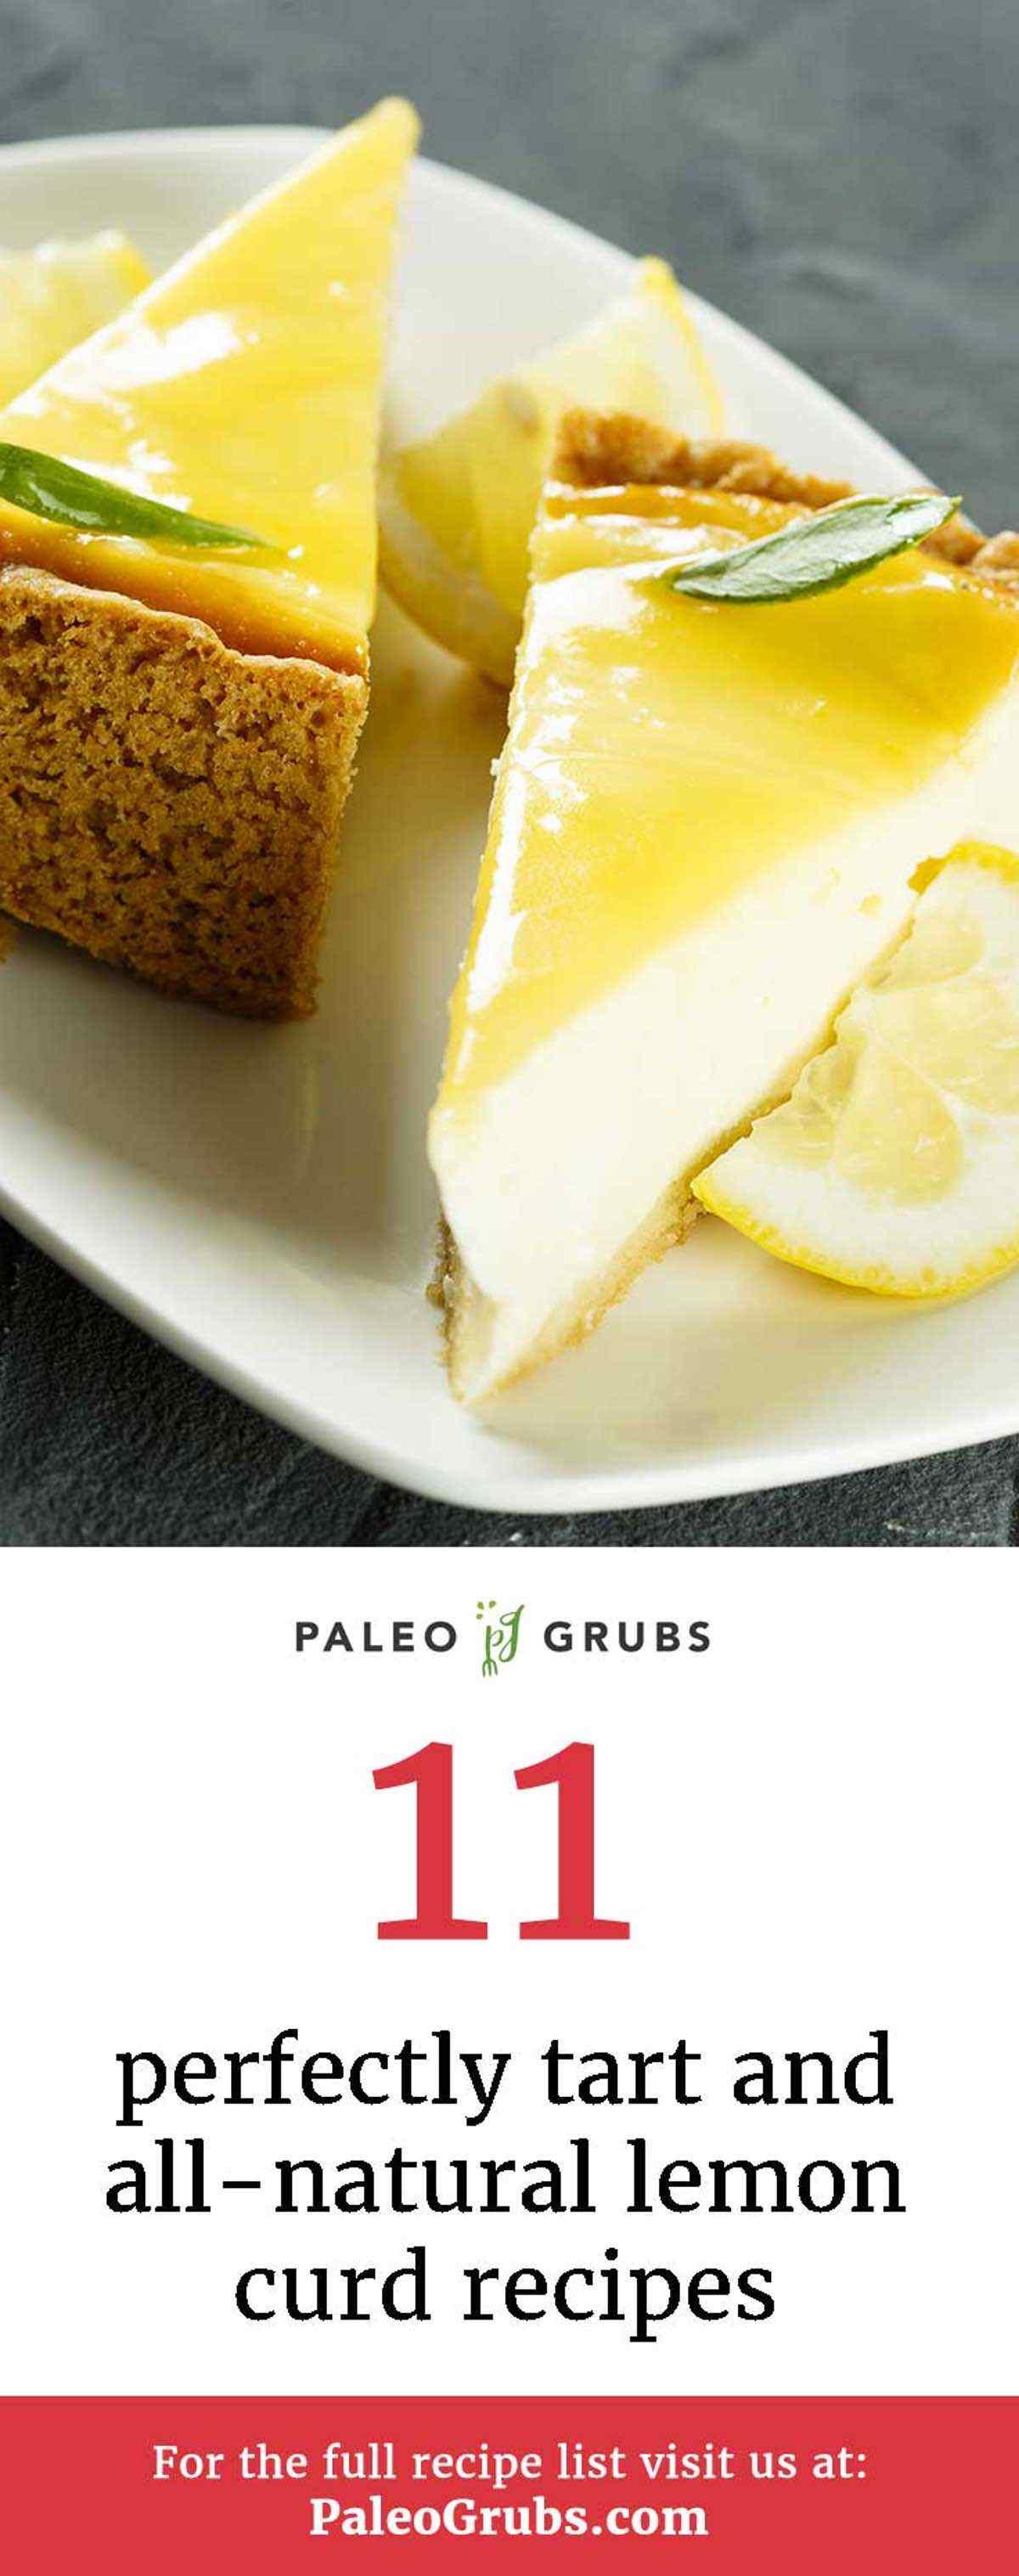 lemon curd recipes